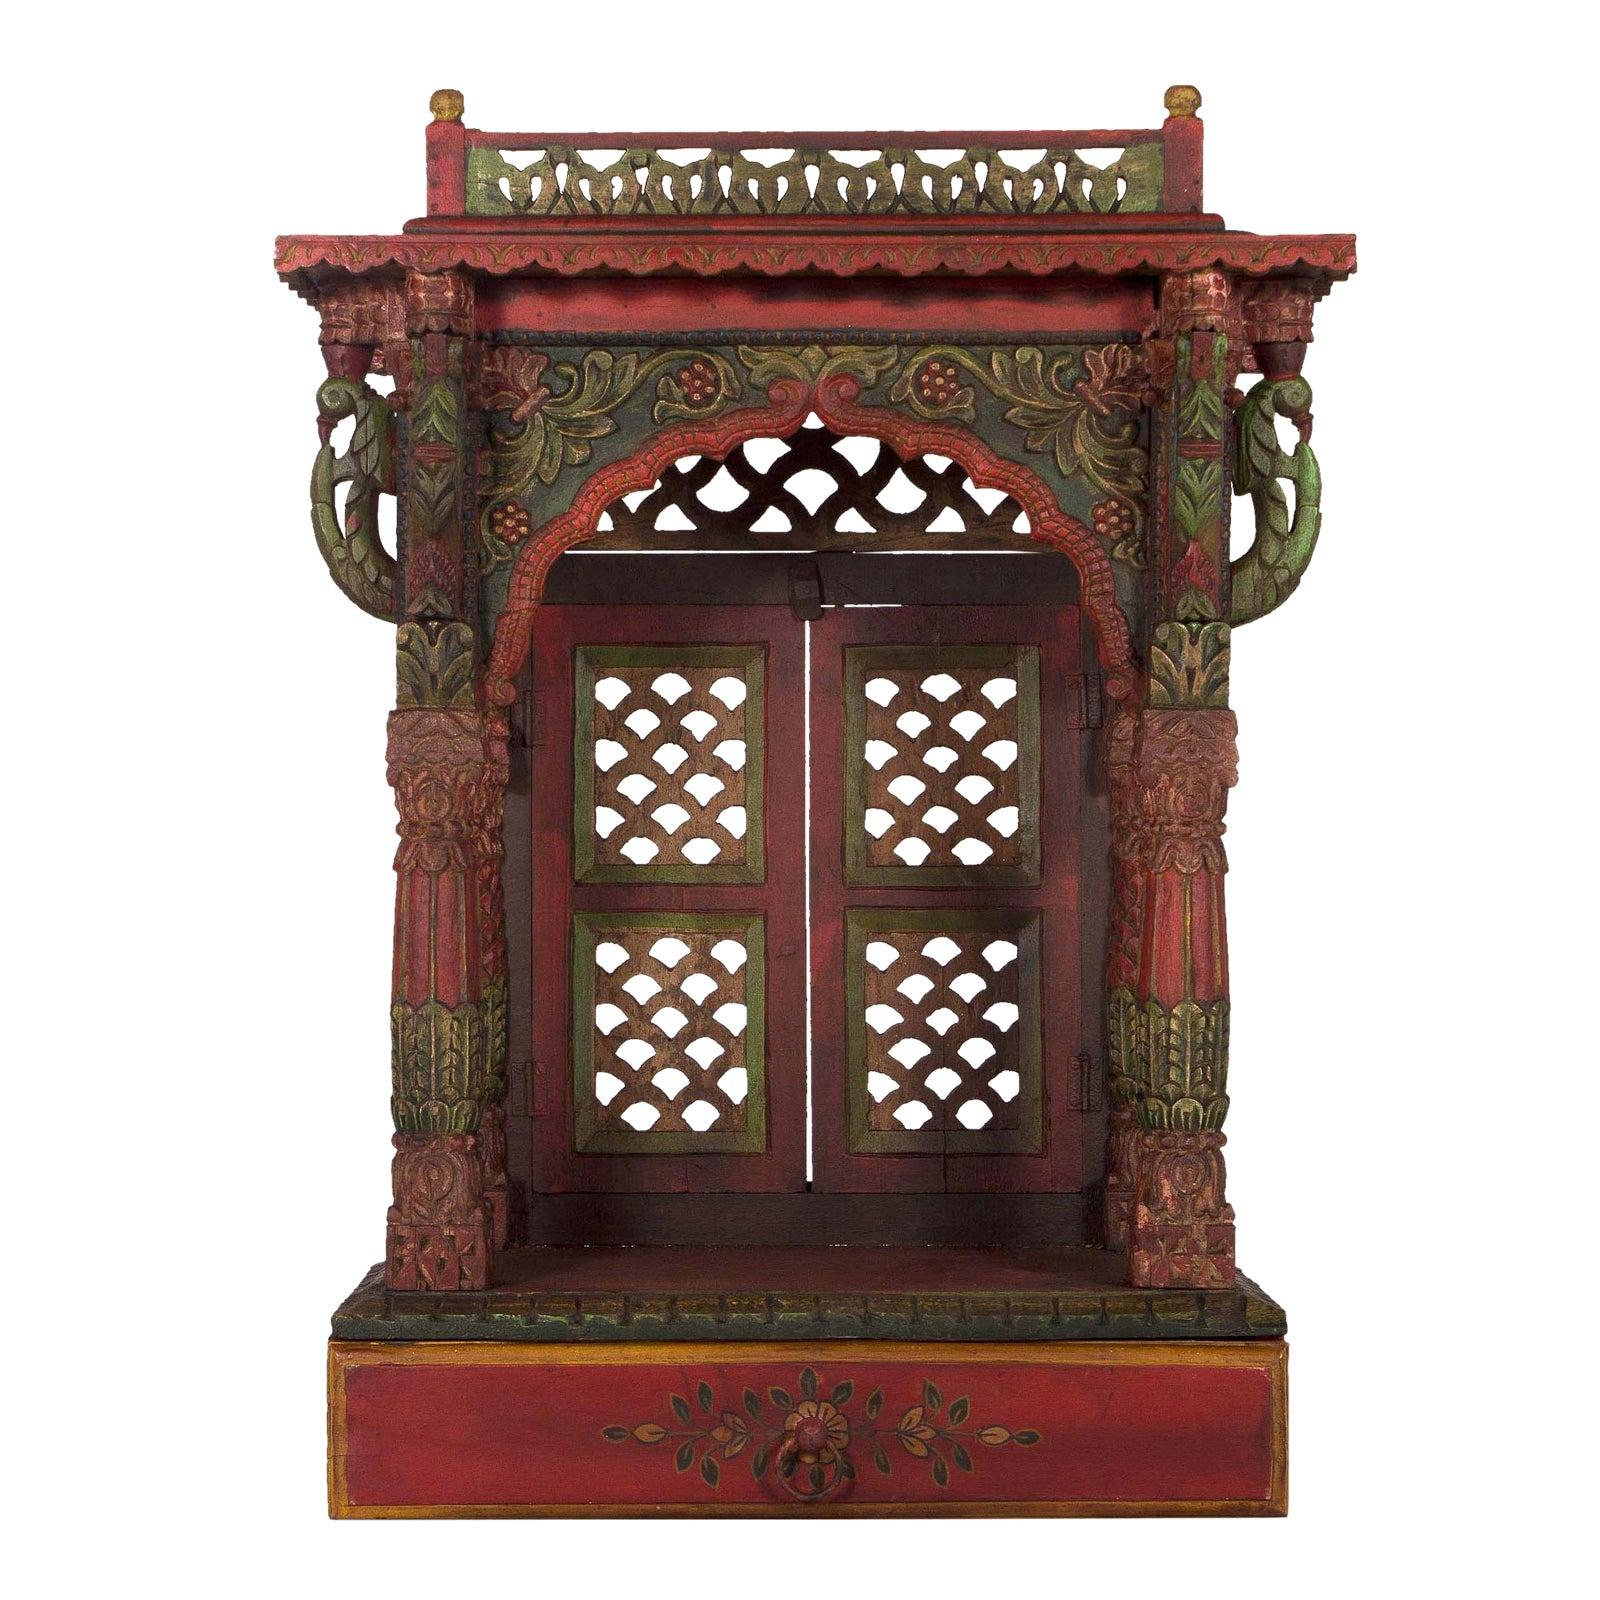 Teak Wood Hand Painted Pooja Mandir Home Temple Mandapam Chairish